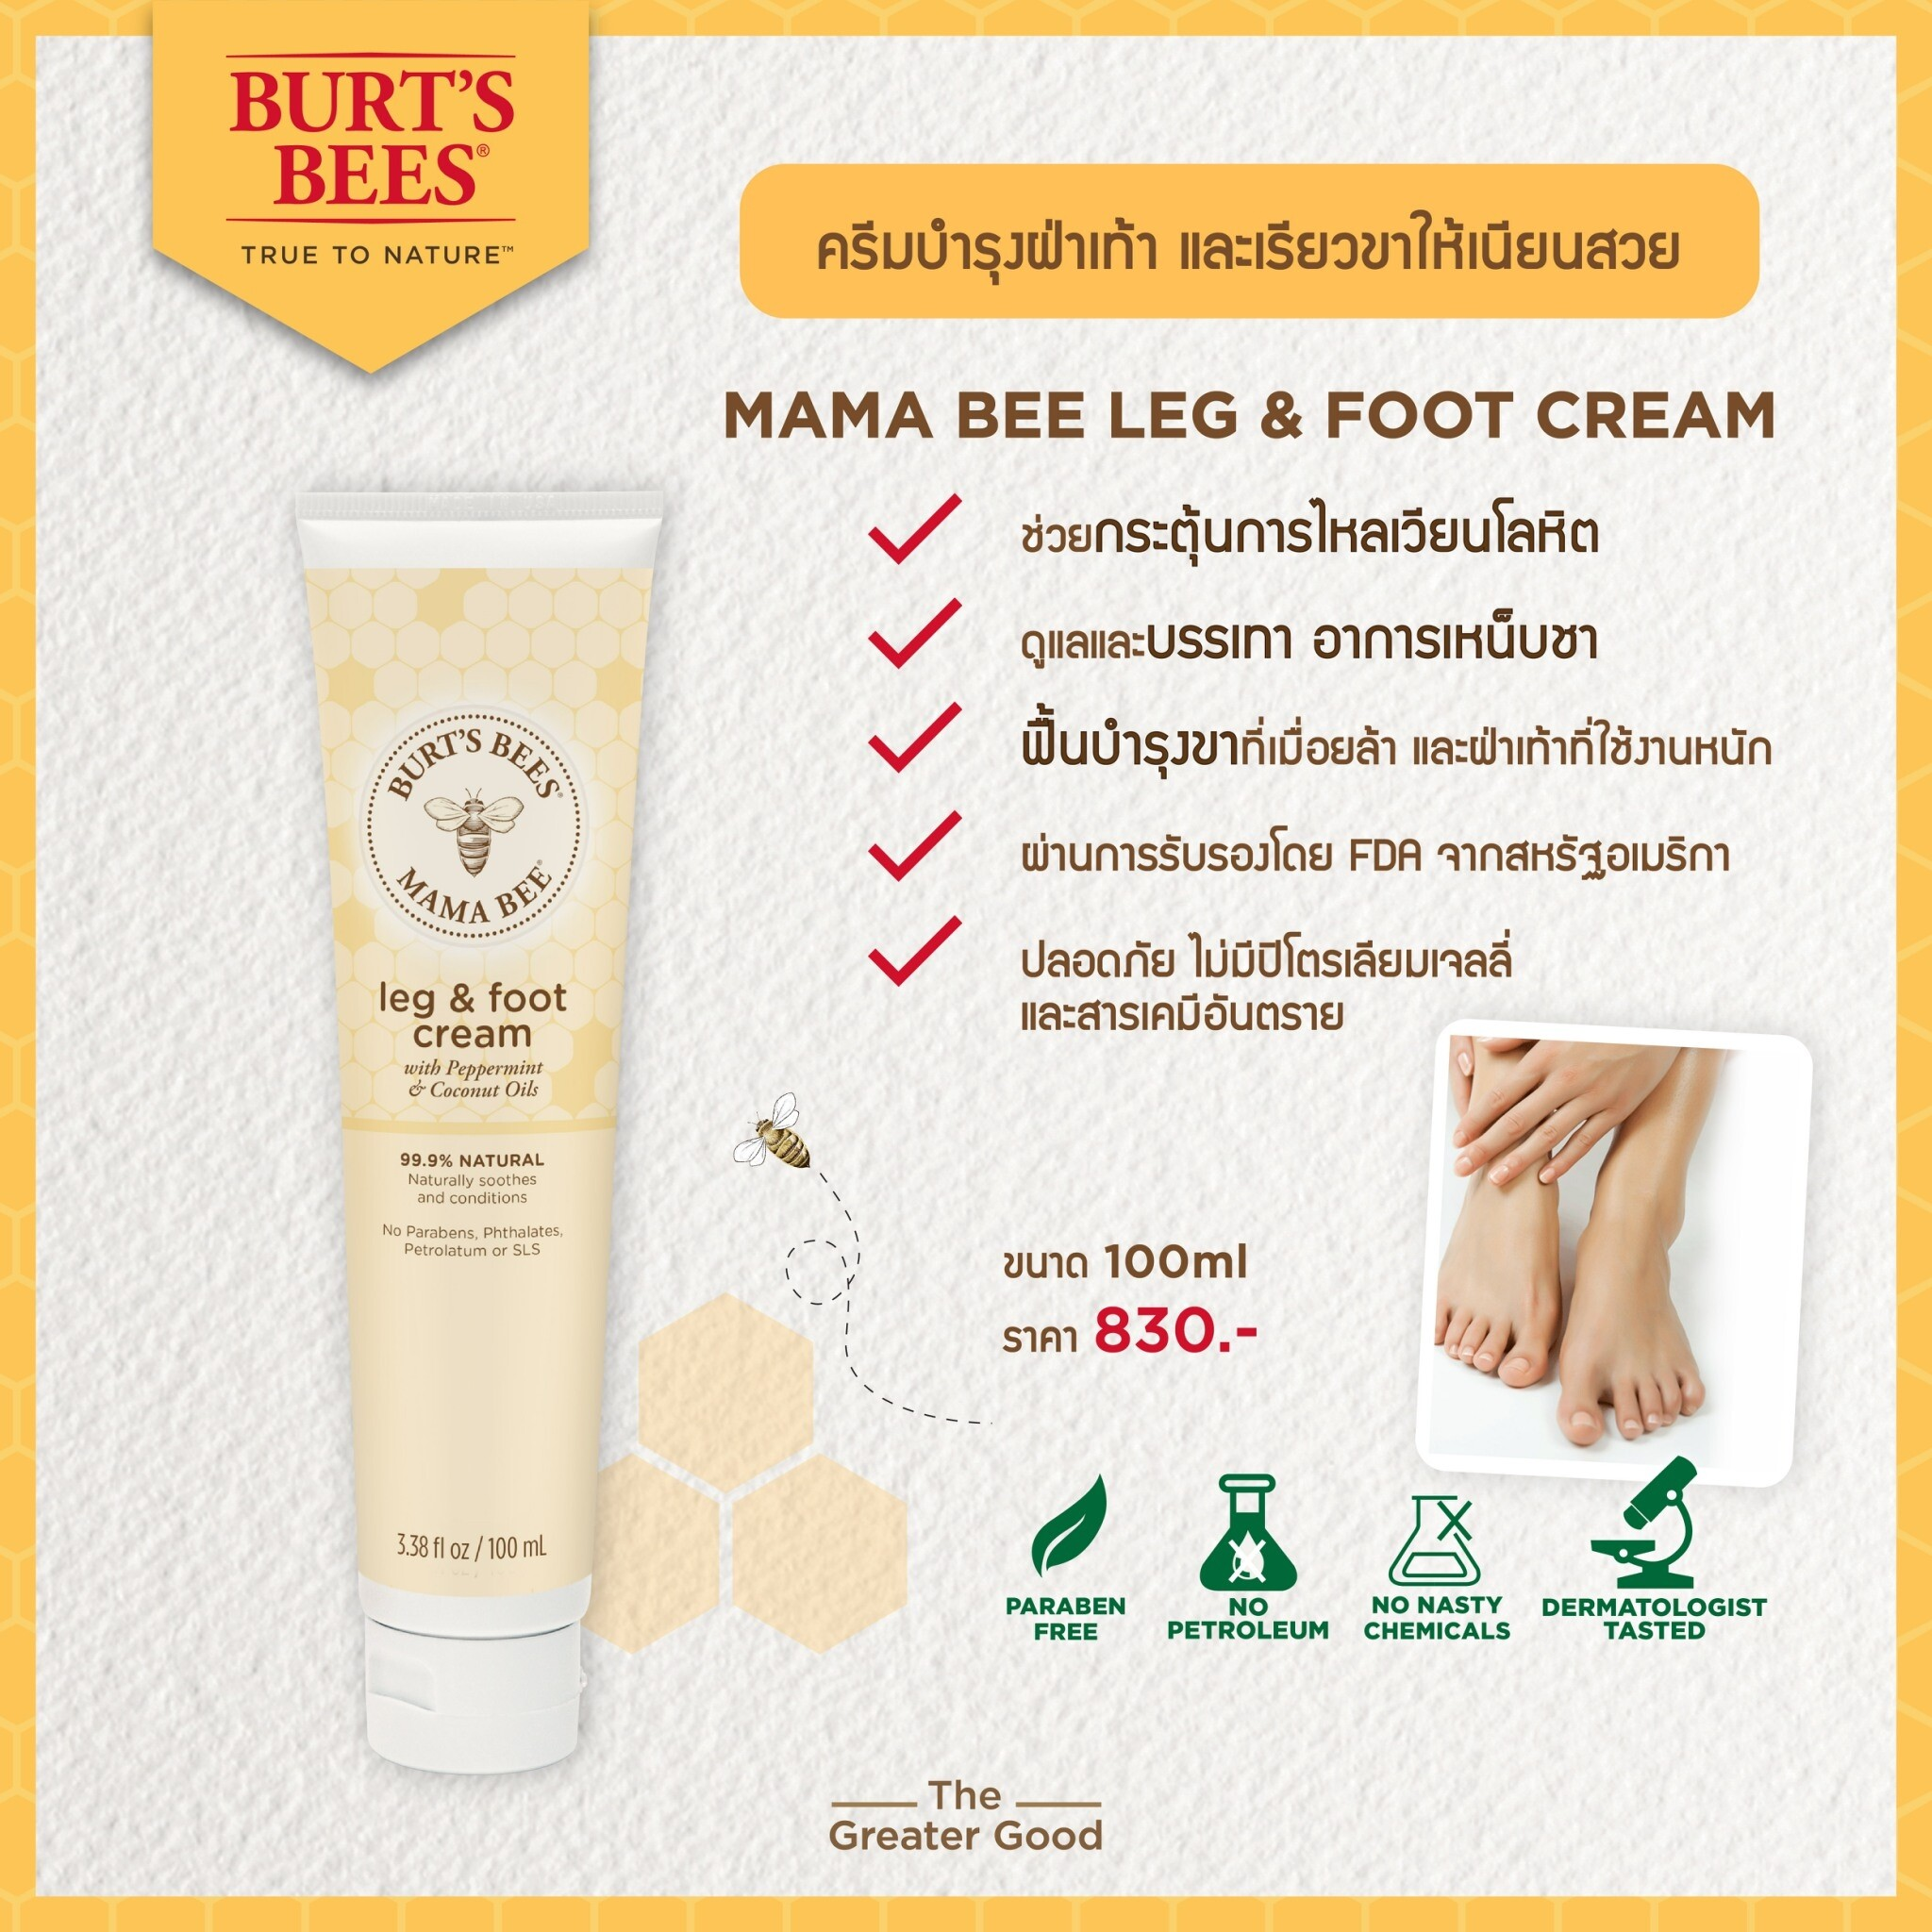 Burt's Bees Mama Bee Leg and Foot Creme เบิร์ตบีส์ มาม่า บี เลค แอนด์ ฟูต ครีม ครีมทาเท้า